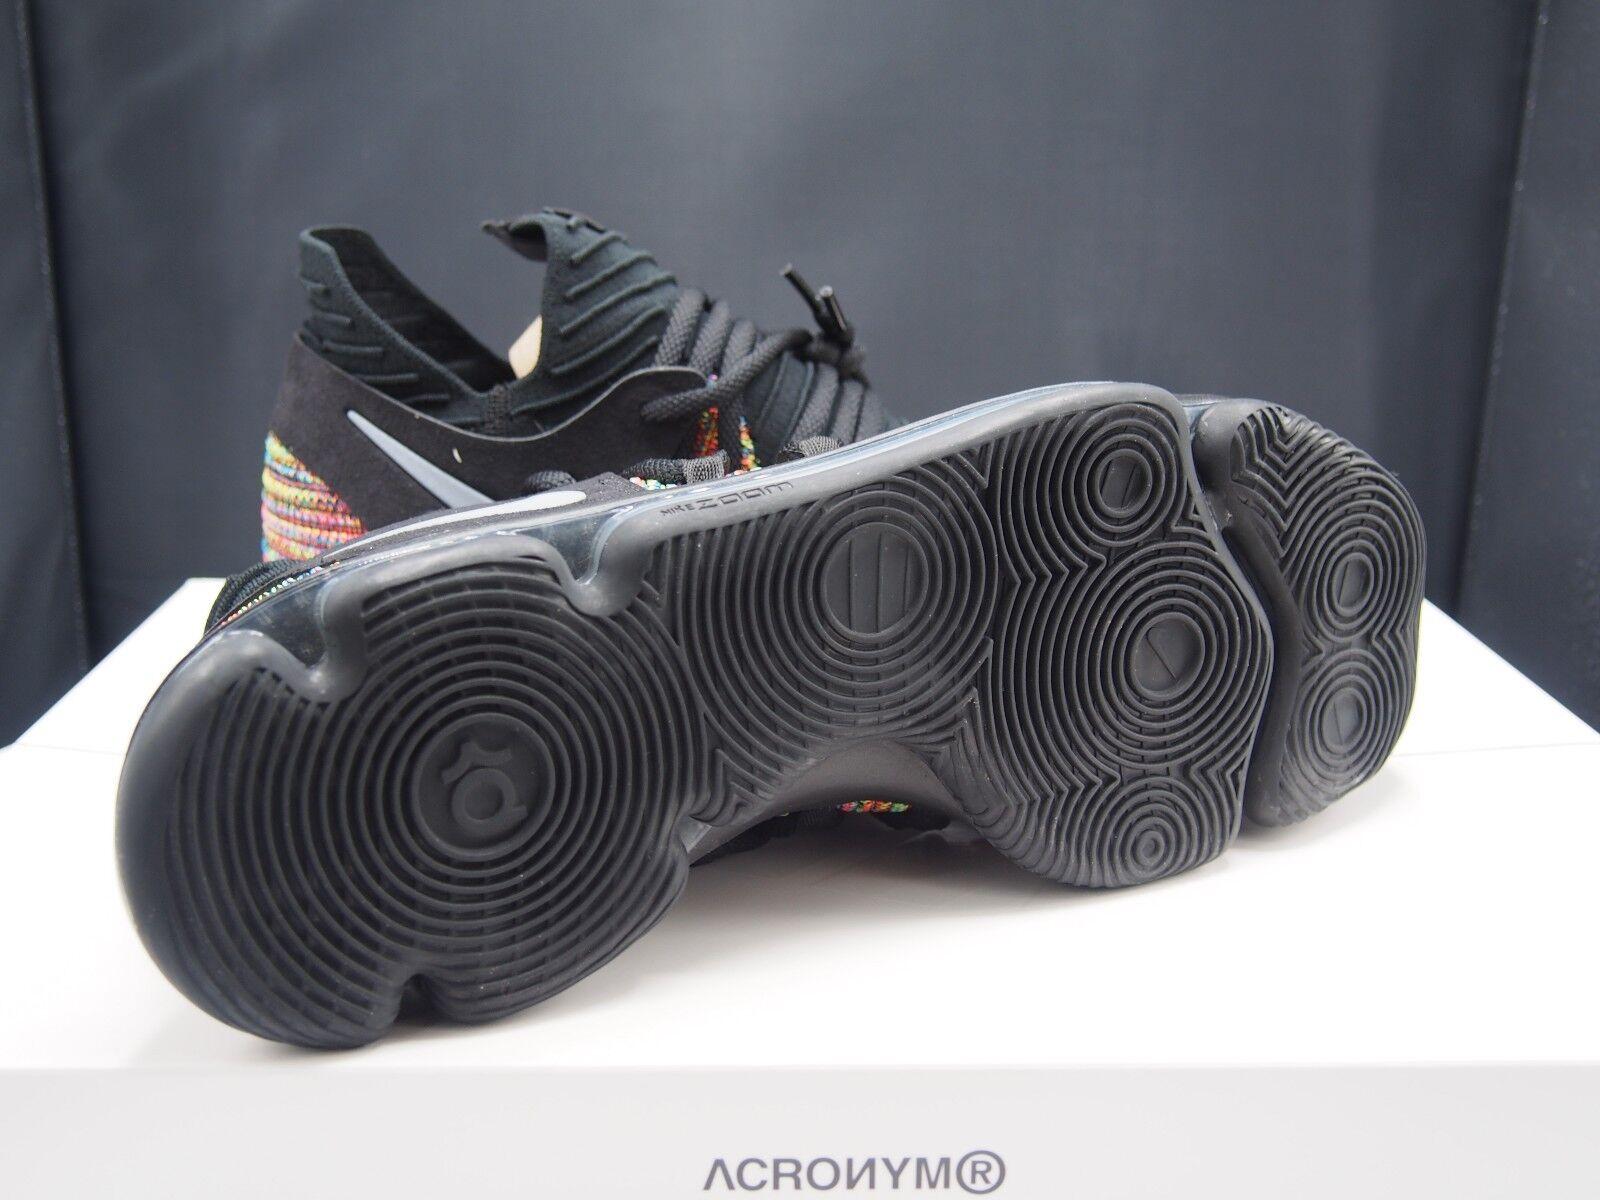 premium selection d6b35 4d061 ... Nike zoom kdx kdx kdx 10